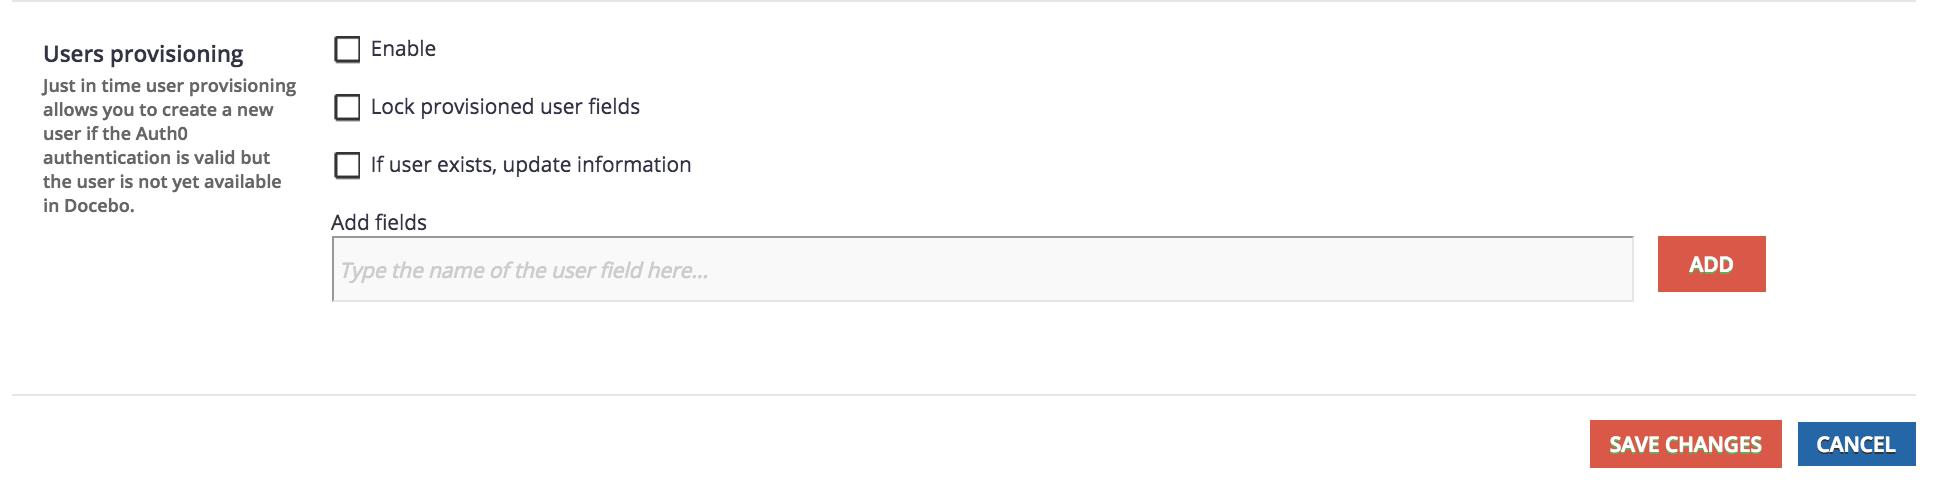 auth0 user provisioning